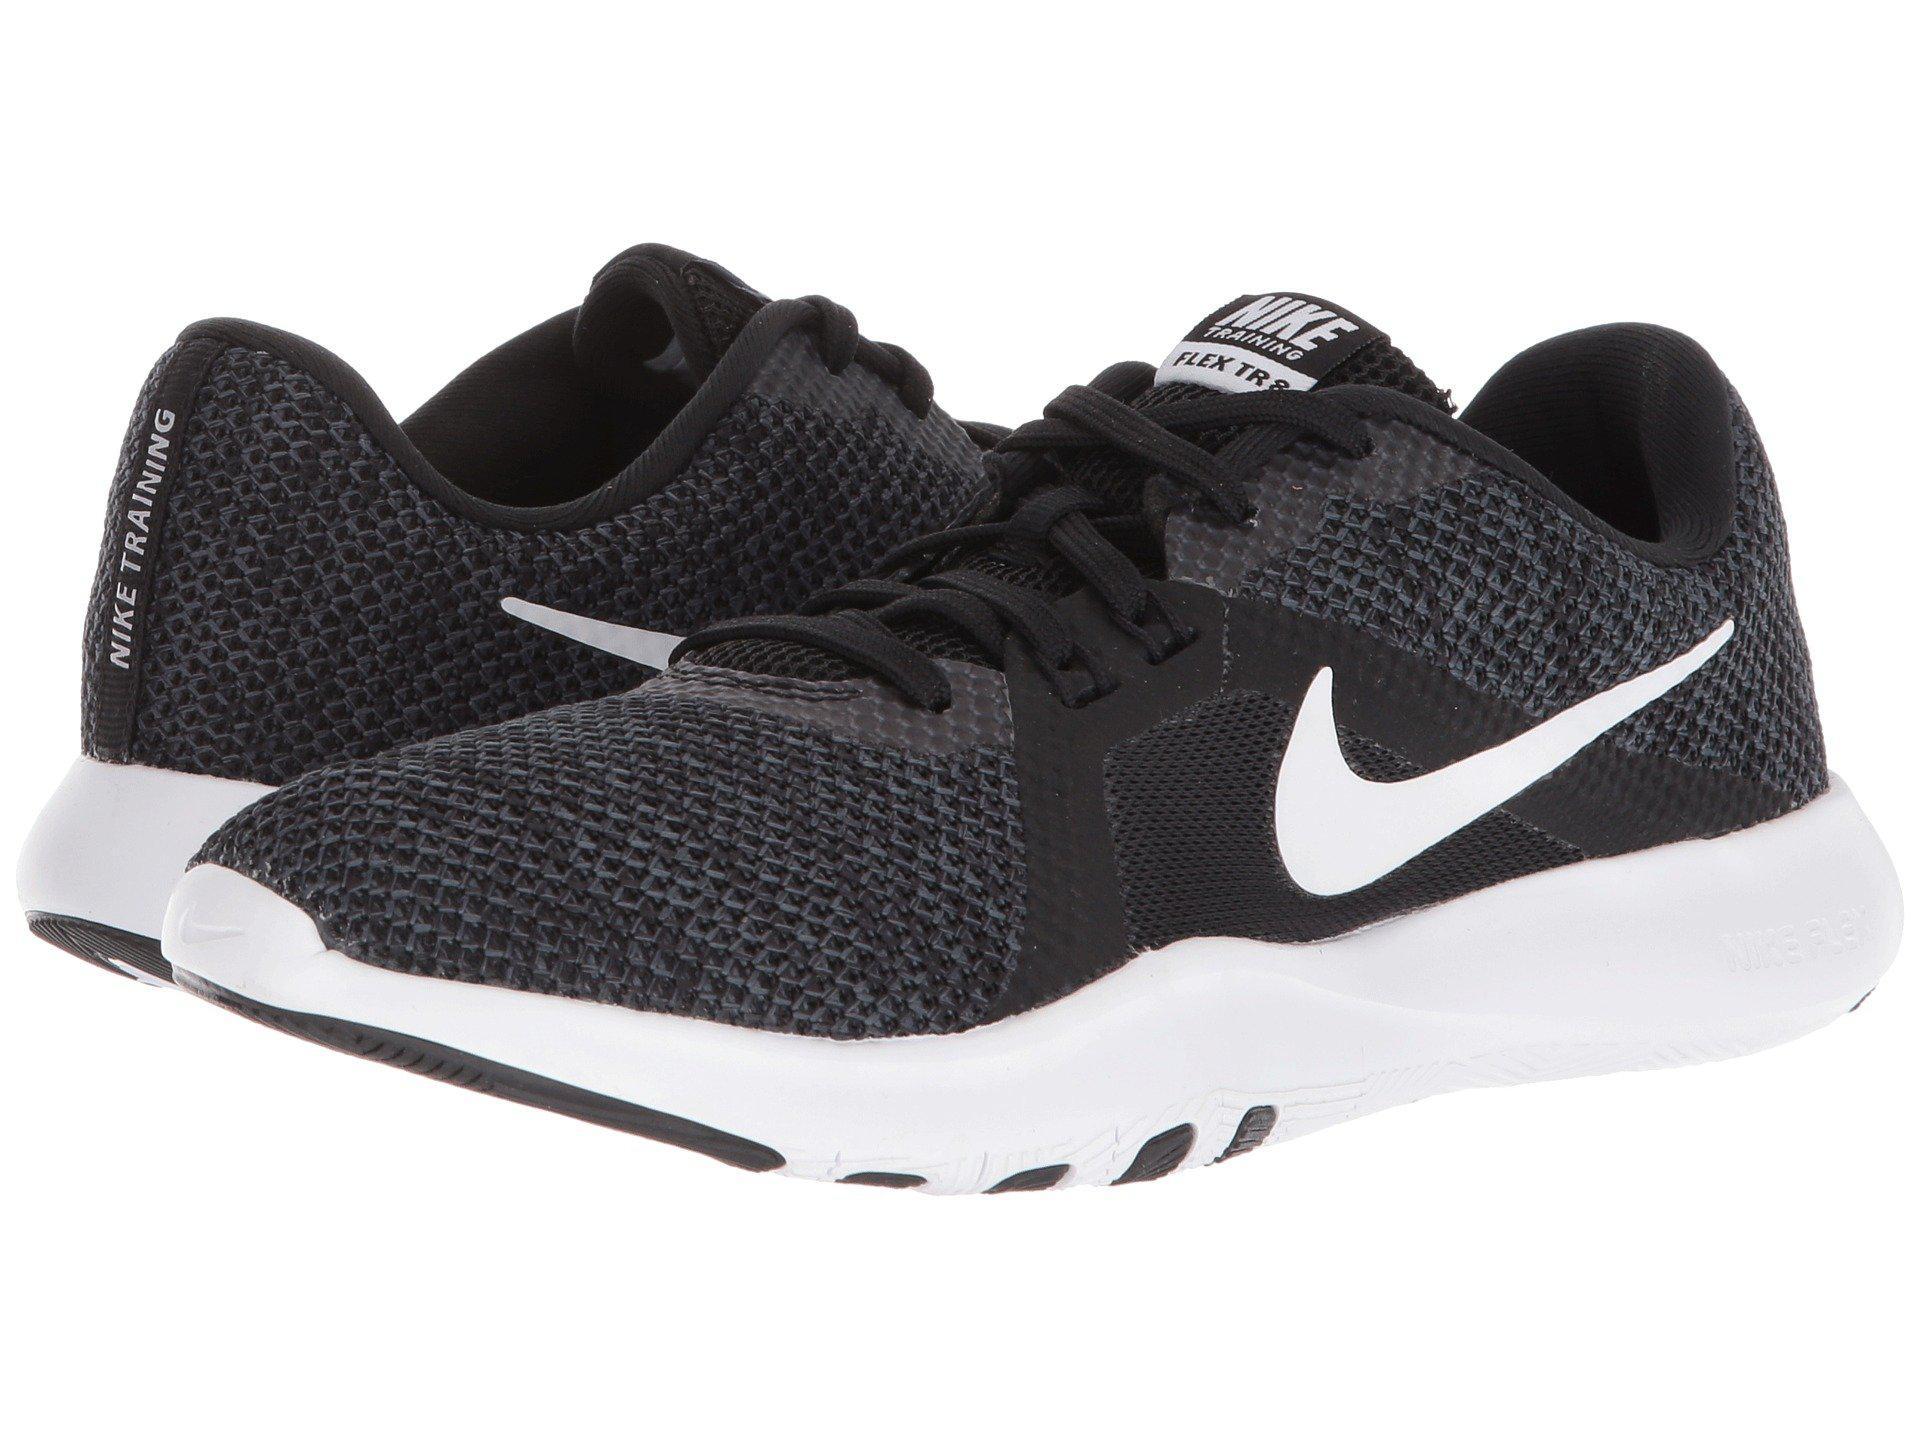 095b3b43a4c Nike. Flex Tr 8 (black white anthracite) Women s Cross Training Shoes